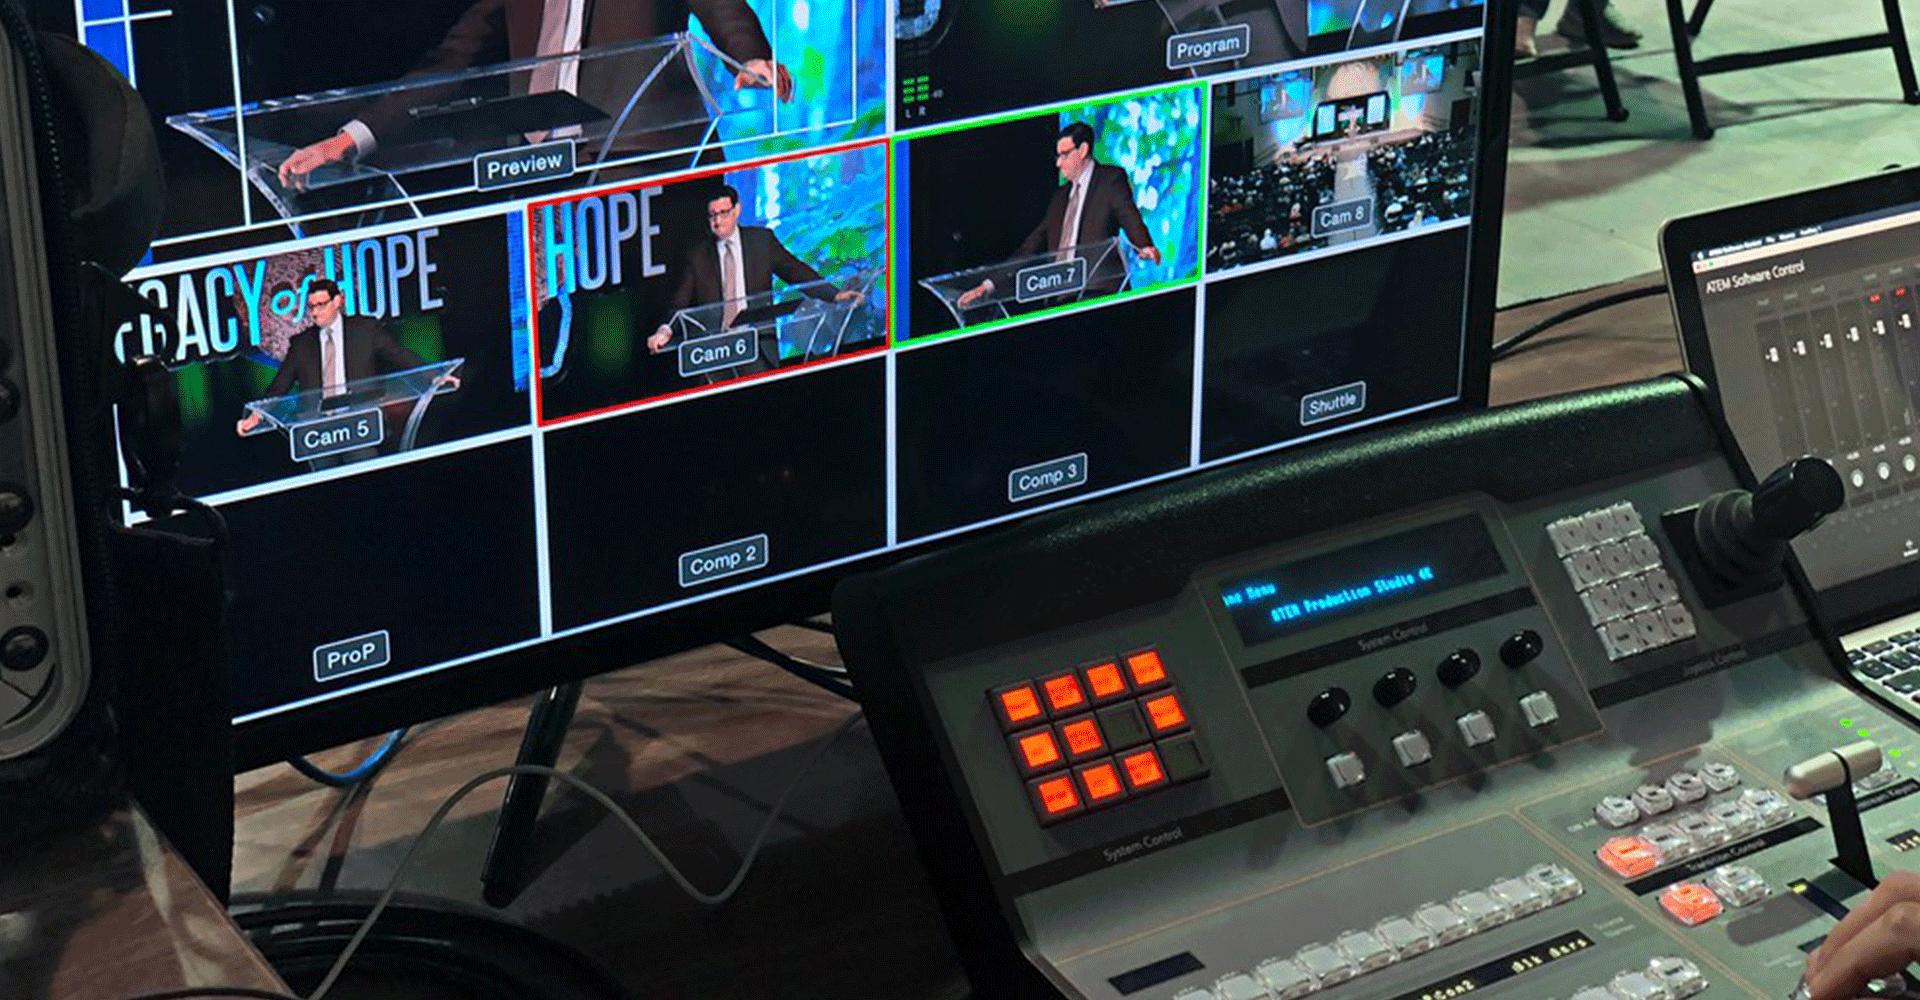 Live broadcast event video company in Doha Qatar 2